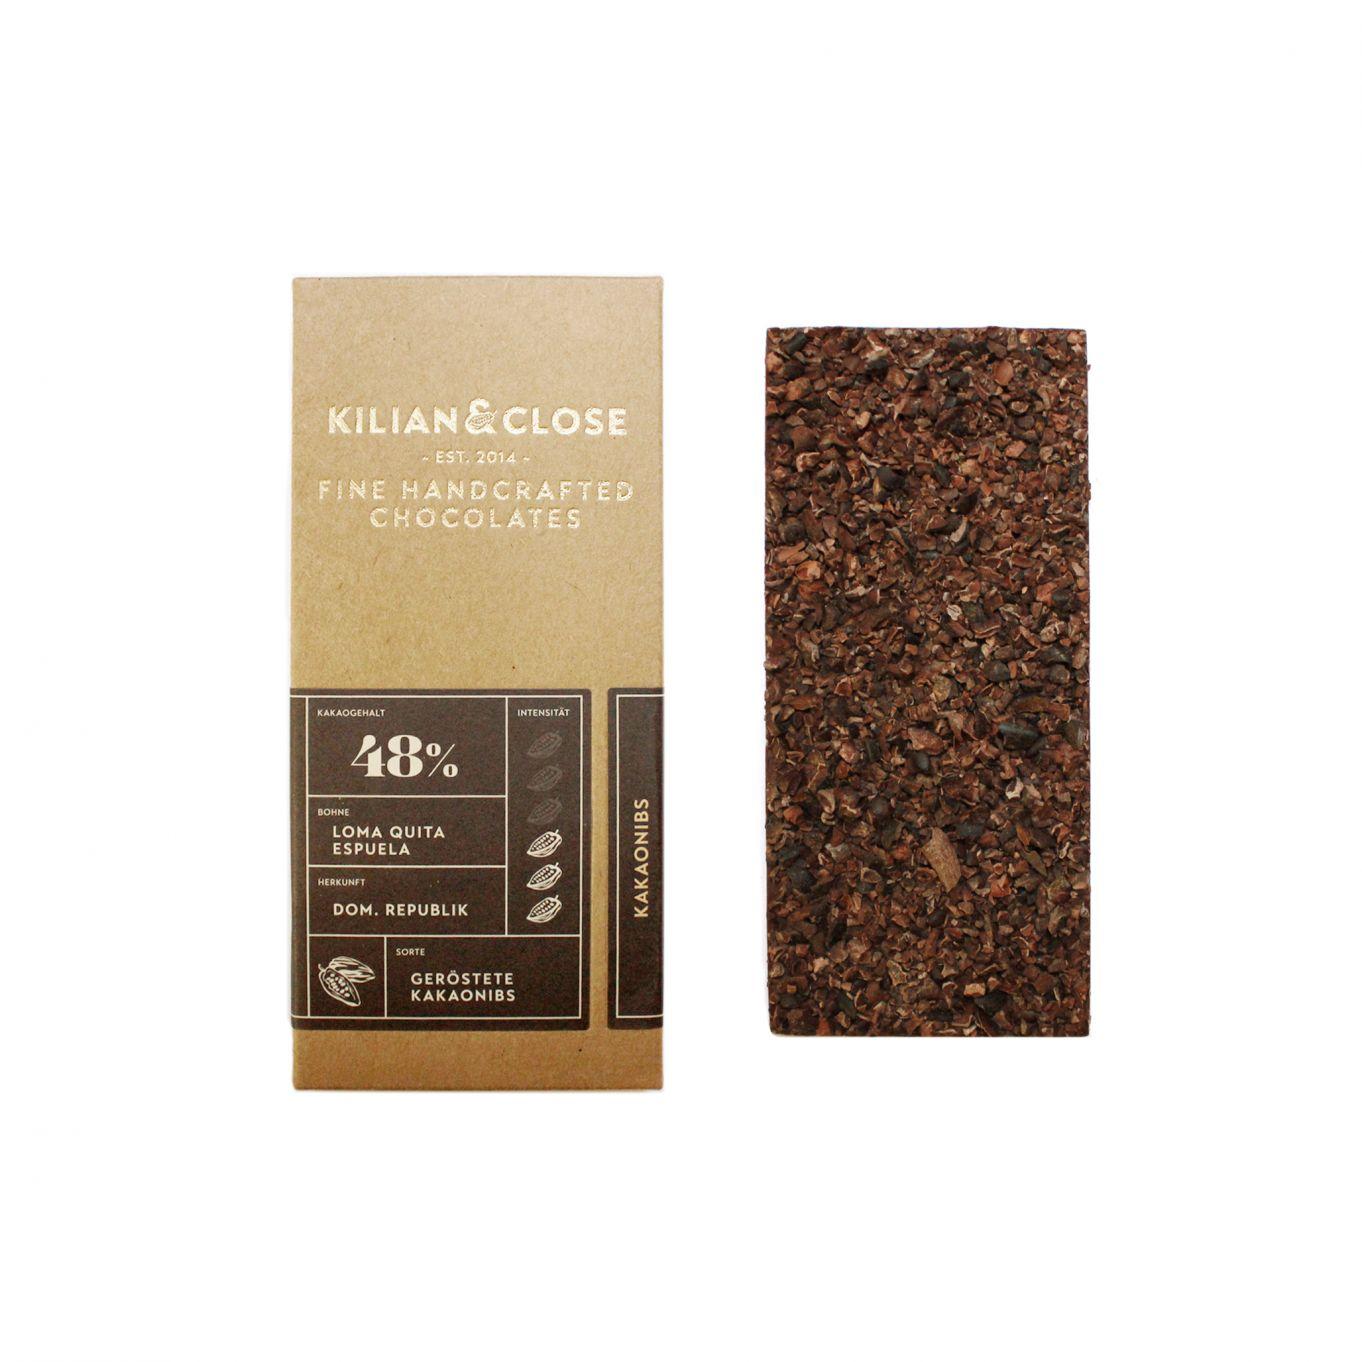 Geröstete Kakaonibs